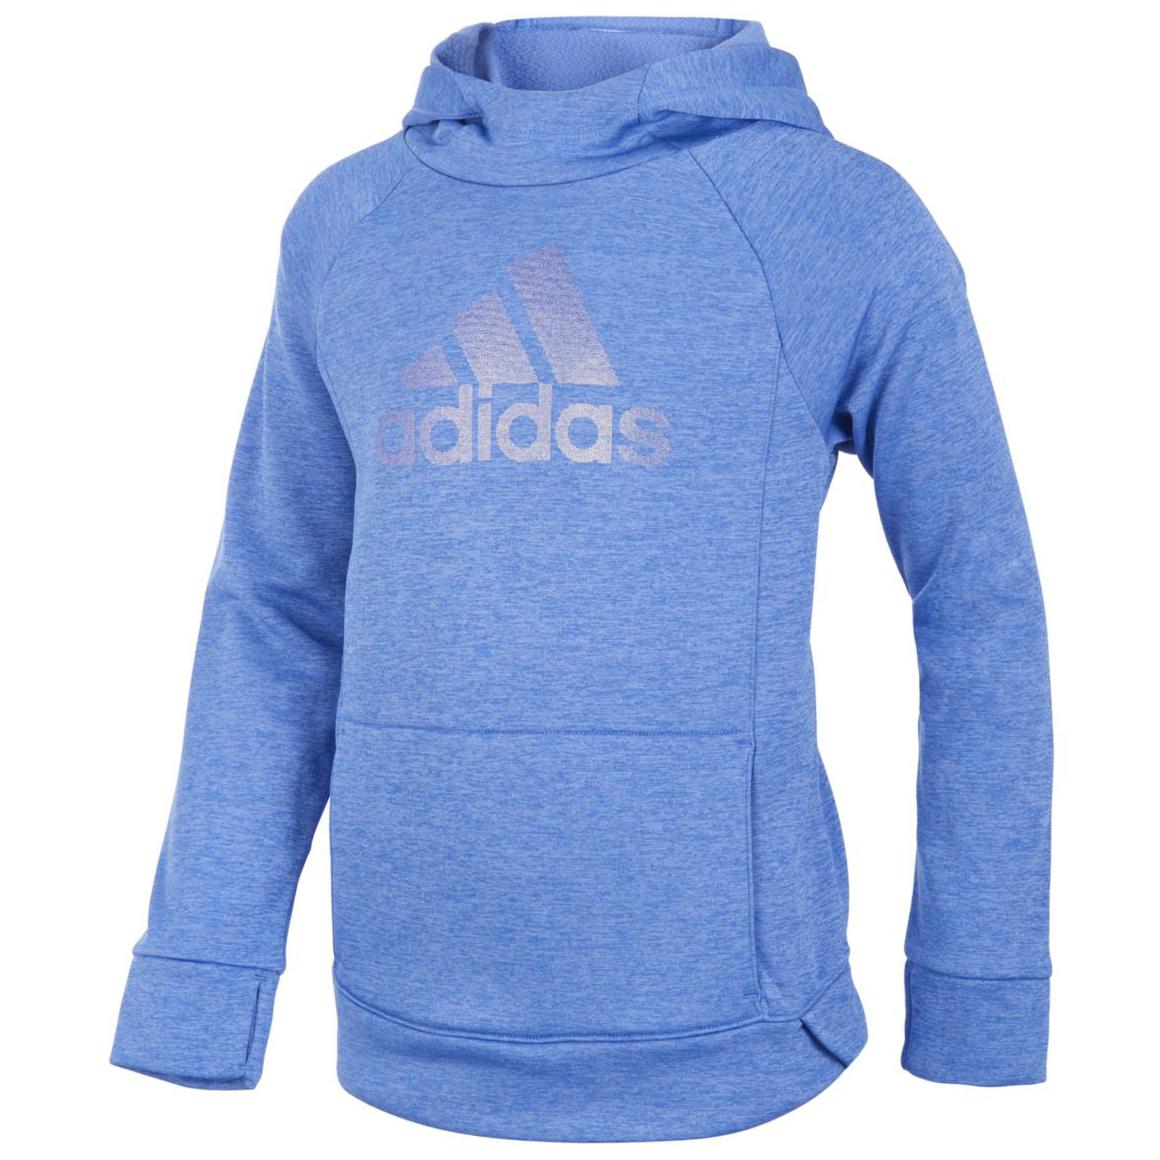 Adidas Little Girls' Push It Pullover Hoodie - Purple, 4